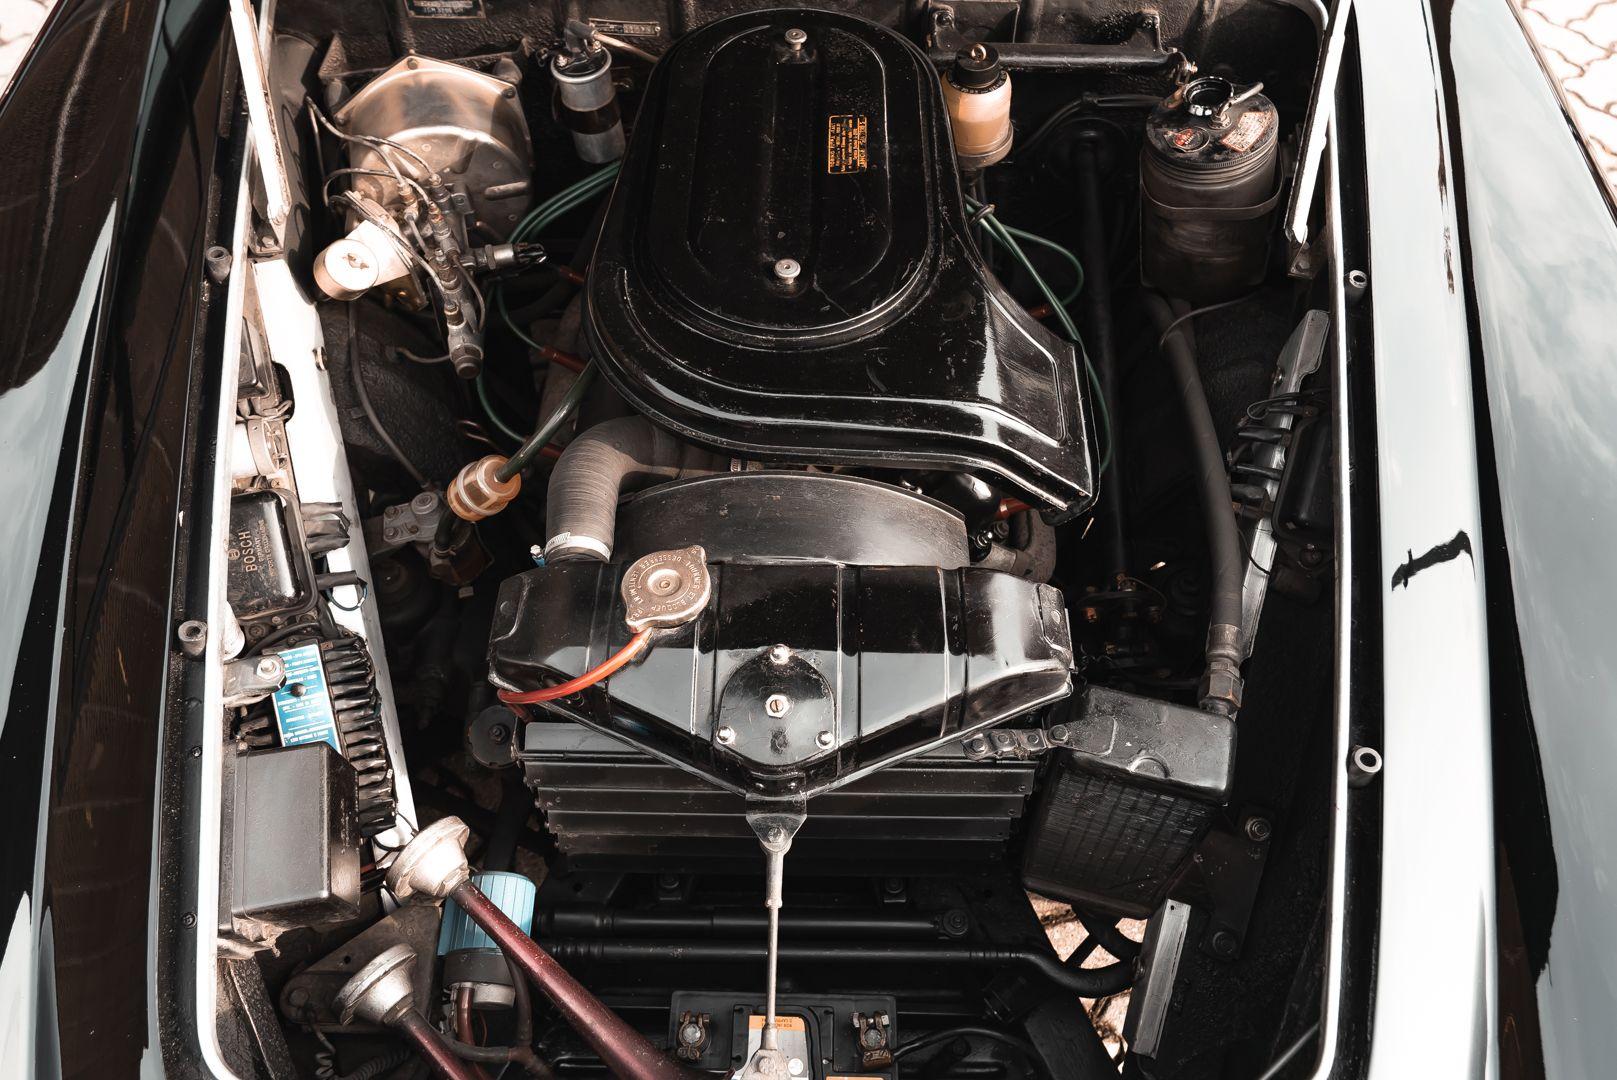 1968 Lancia Flaminia Touring Convertible 2800 3C 79164